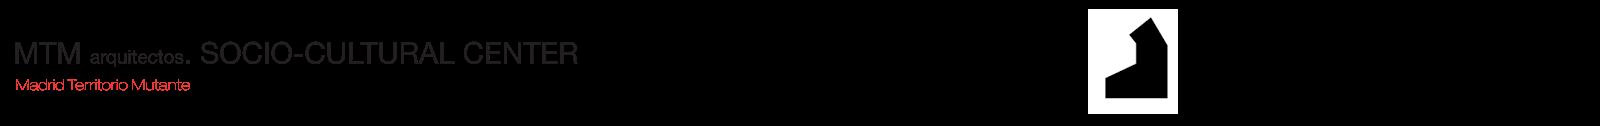 WORKS: Reinosa